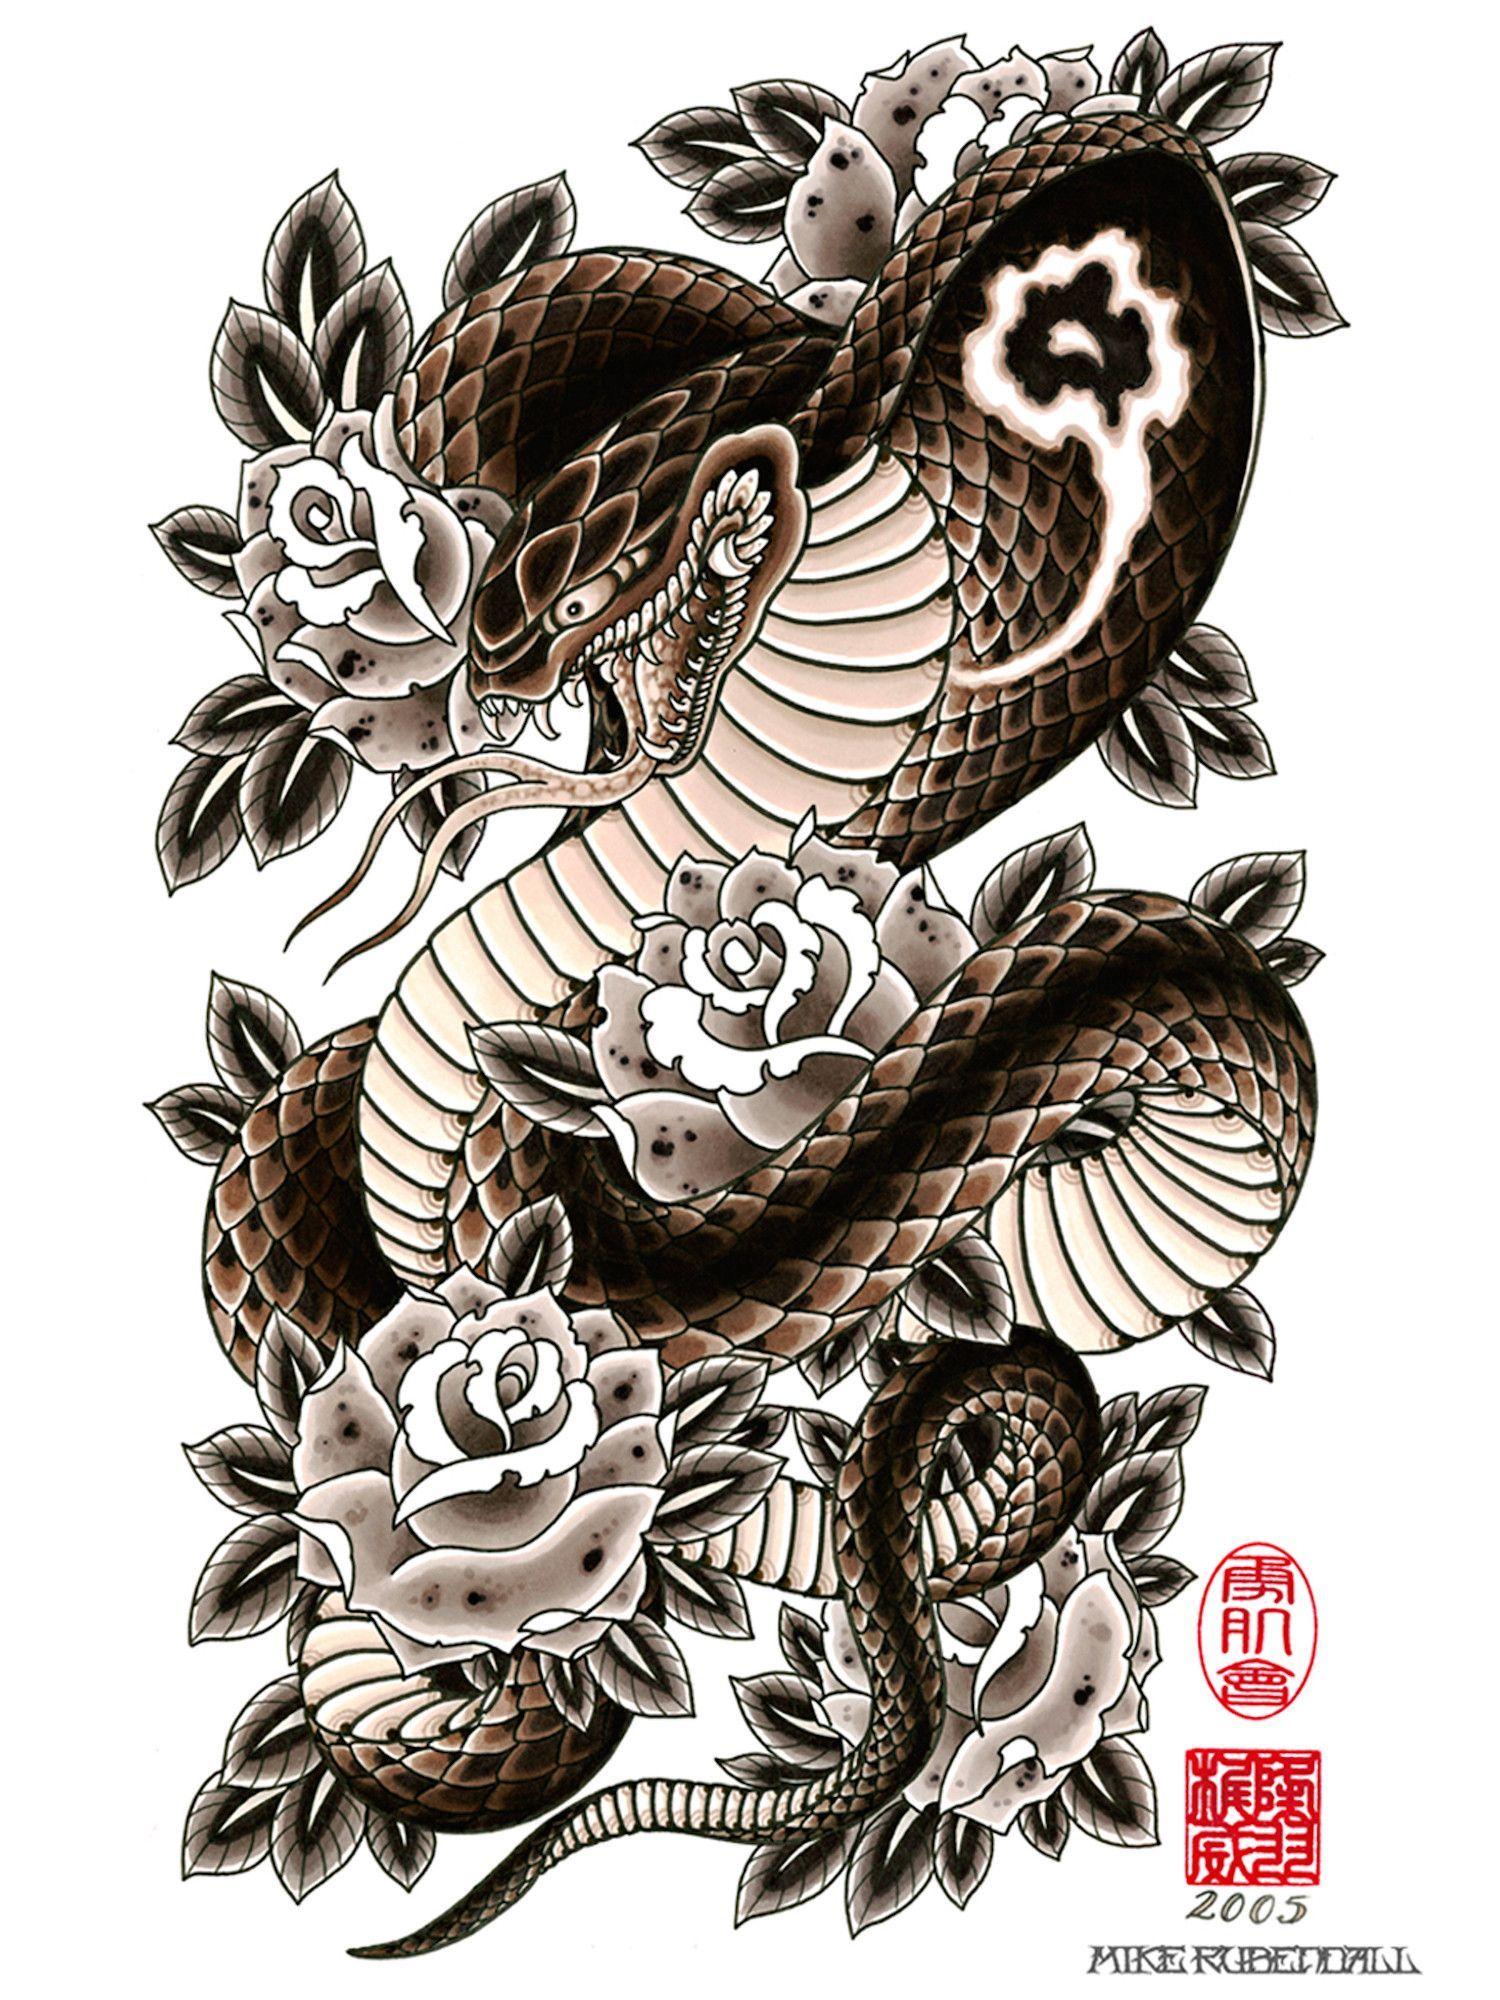 Cobra & Roses Cobra tattoo, Japanese snake tattoo, Snake